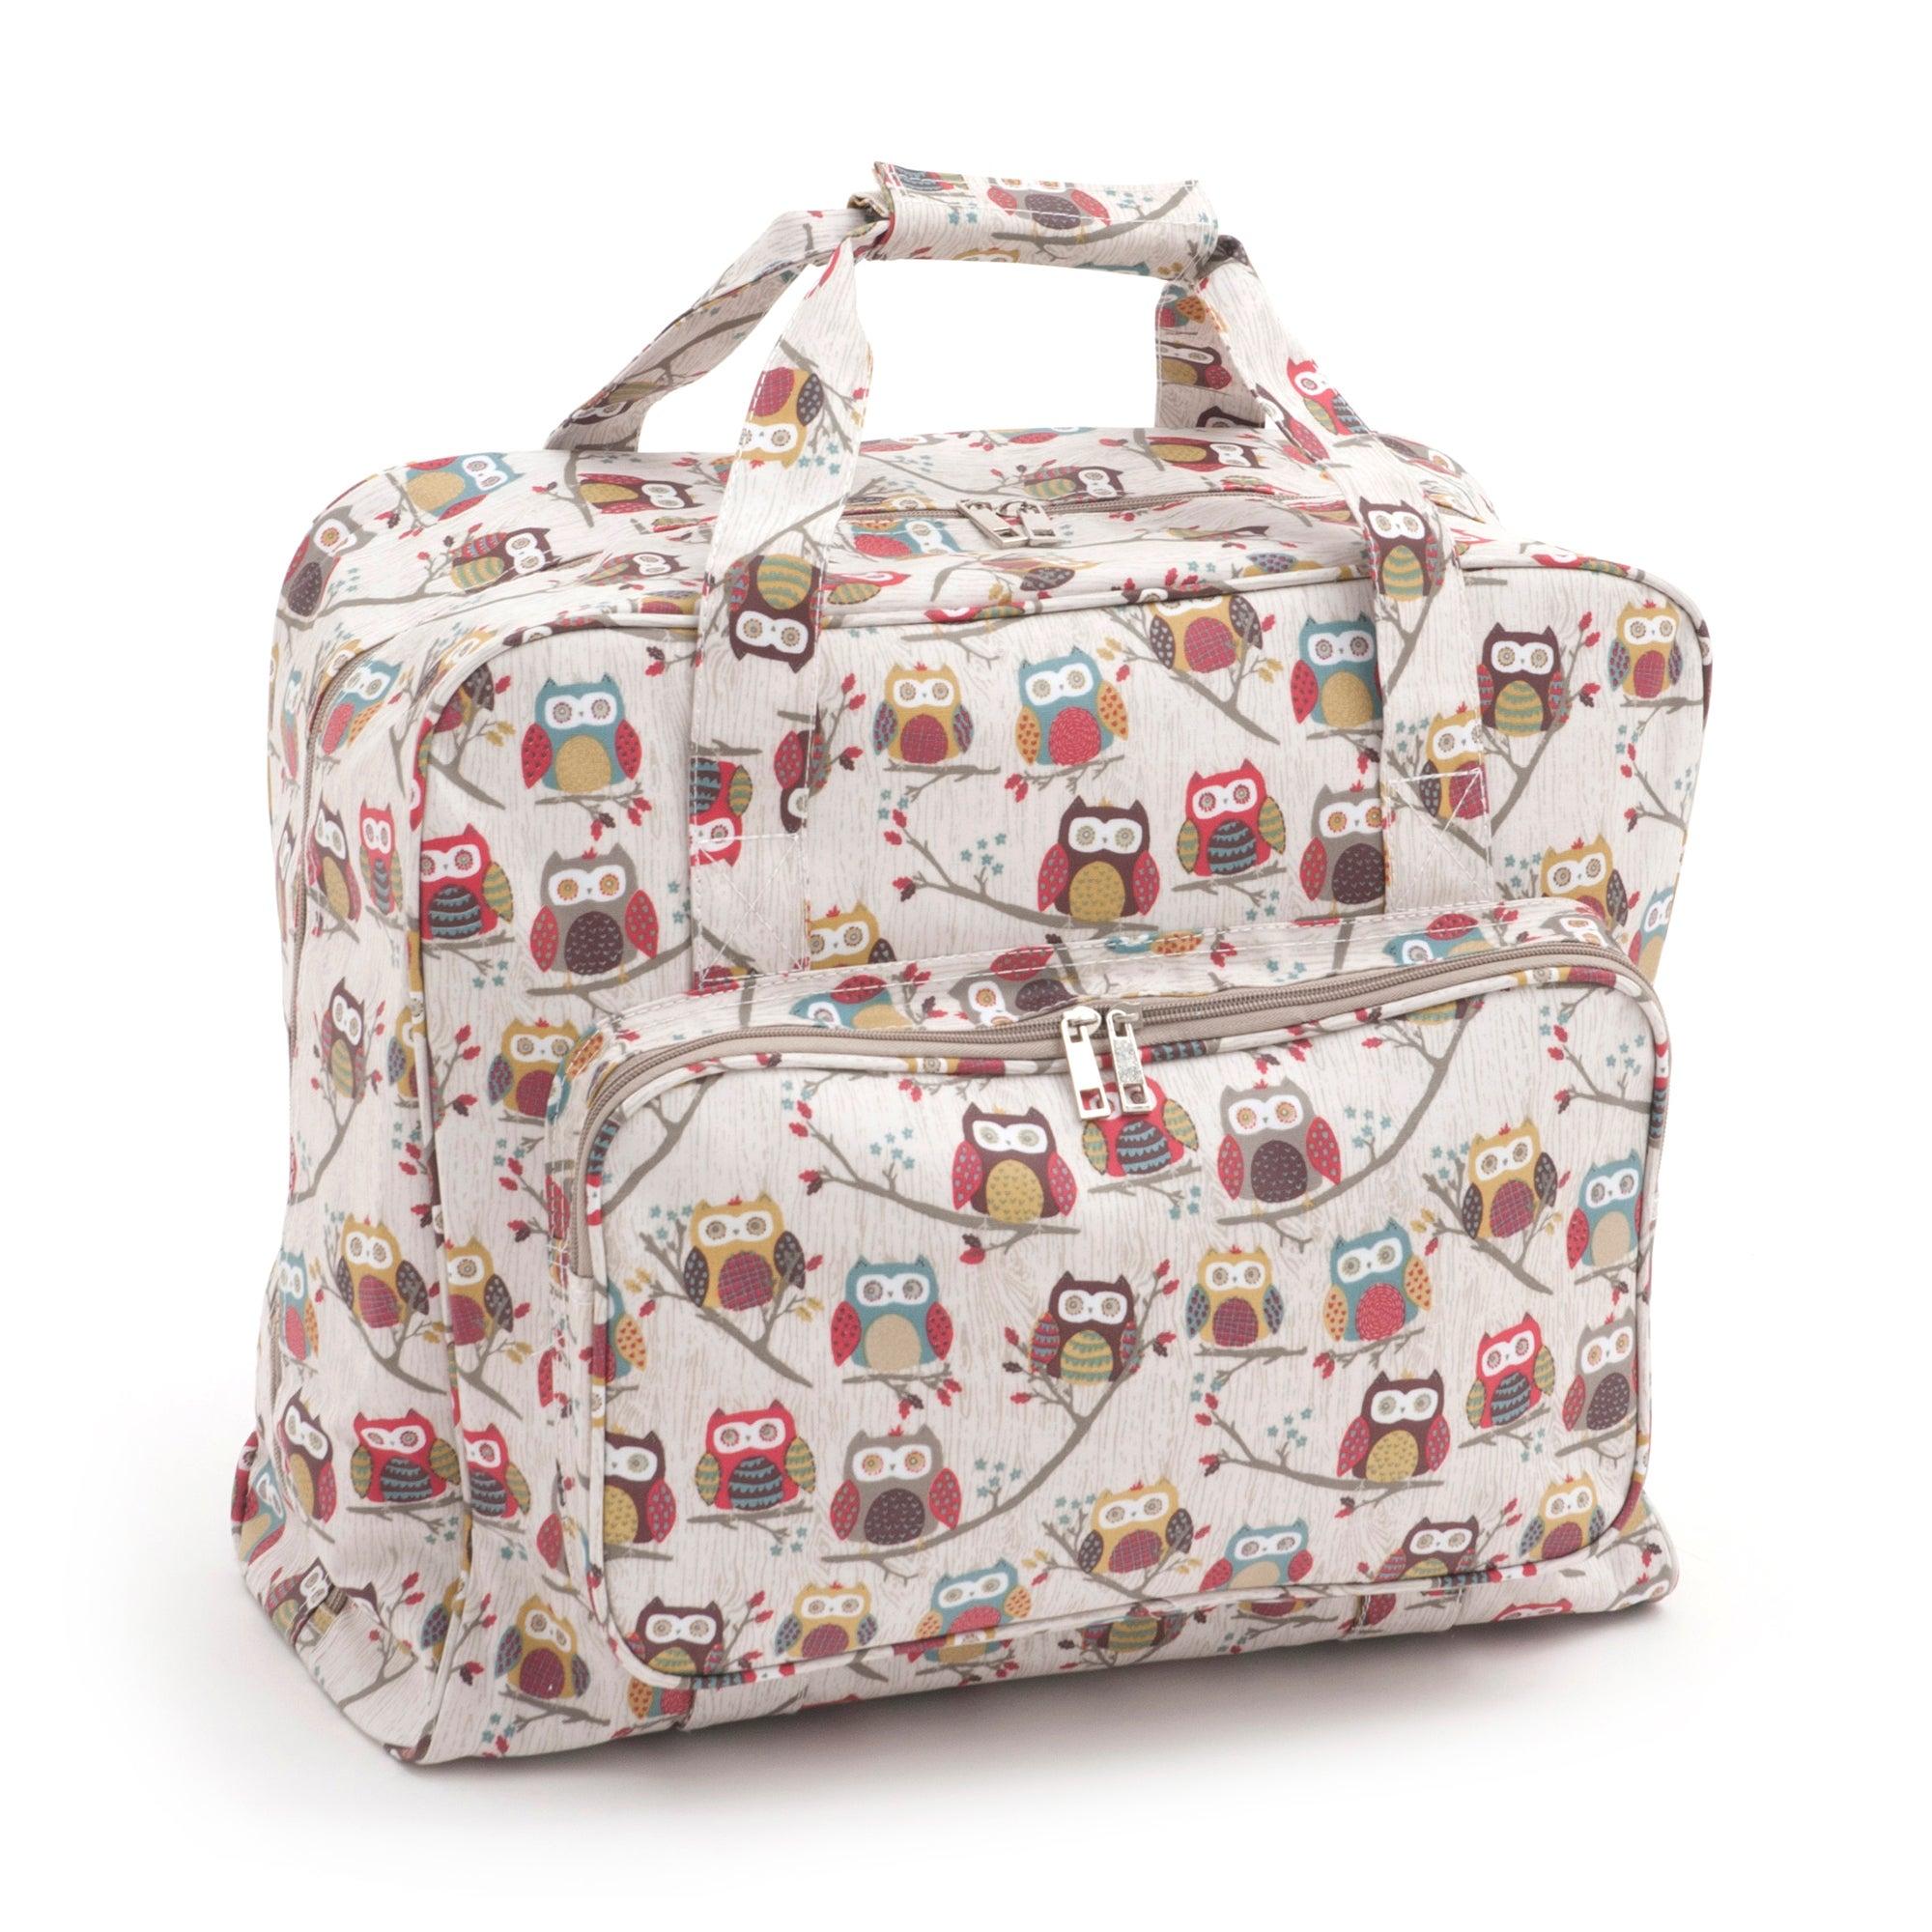 Hoot Sewing Machine Bag Assorted